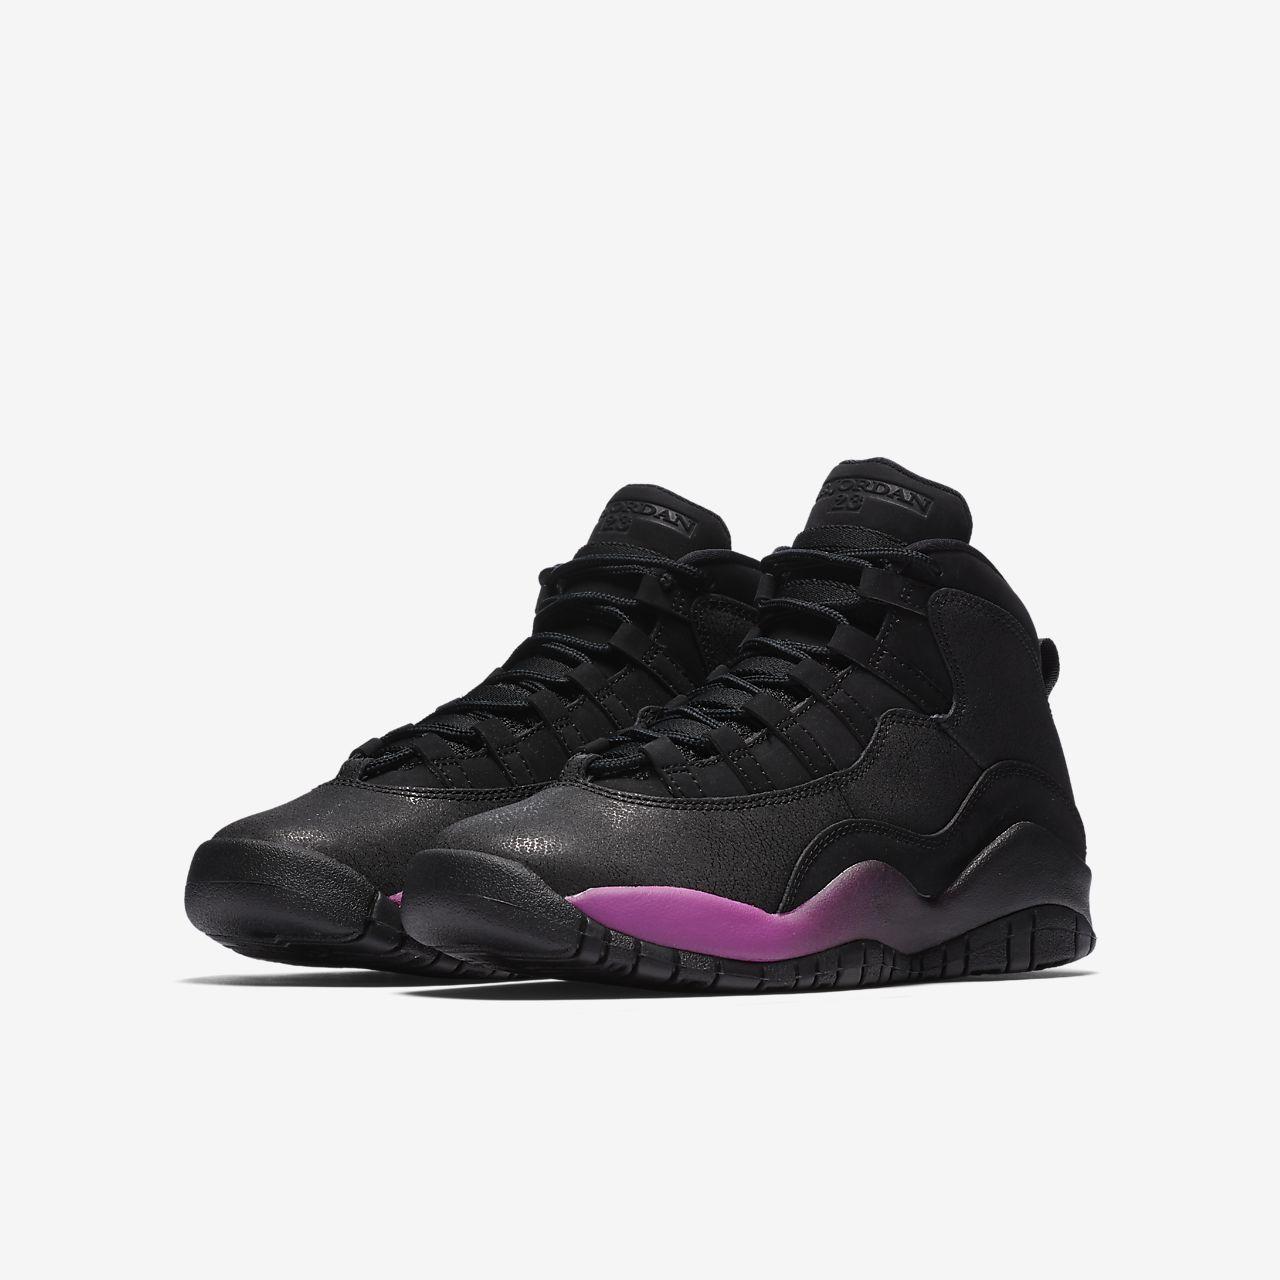 d8fb593c41770 Air Jordan X Retro (3-9) Older Kids  Basketball Shoe. Nike.com HR